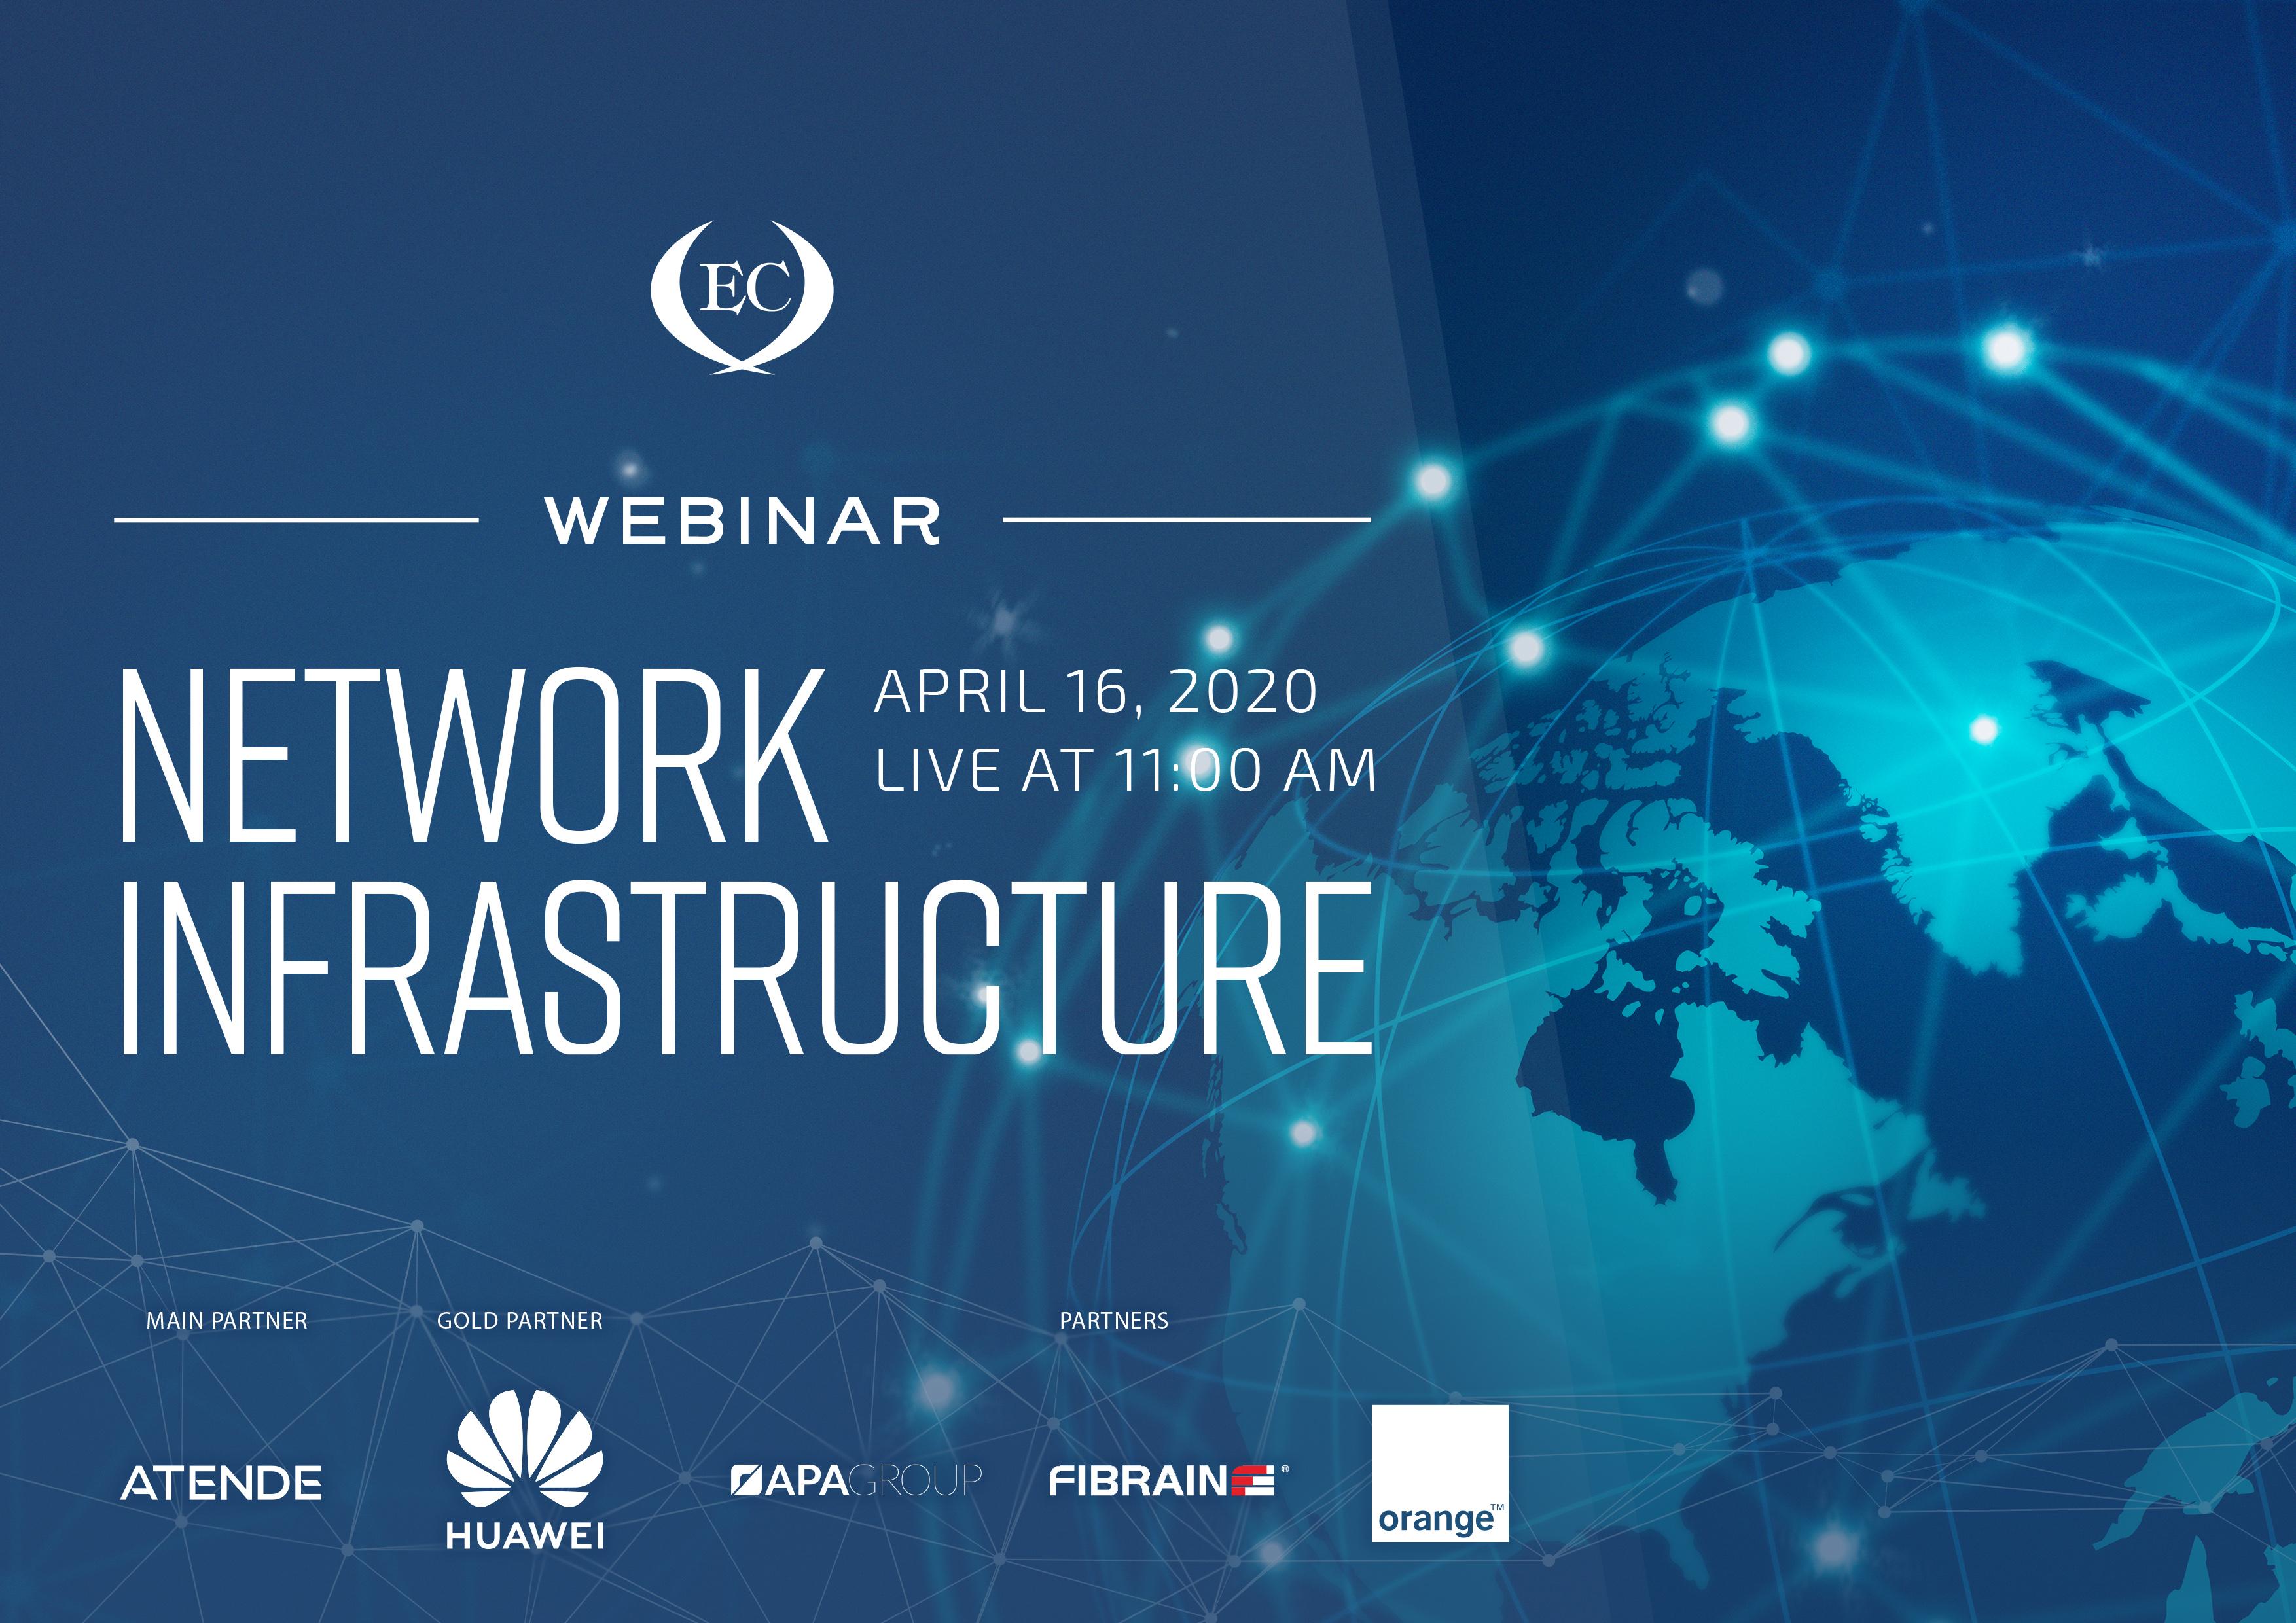 Baner Infrastruktura sieci EN